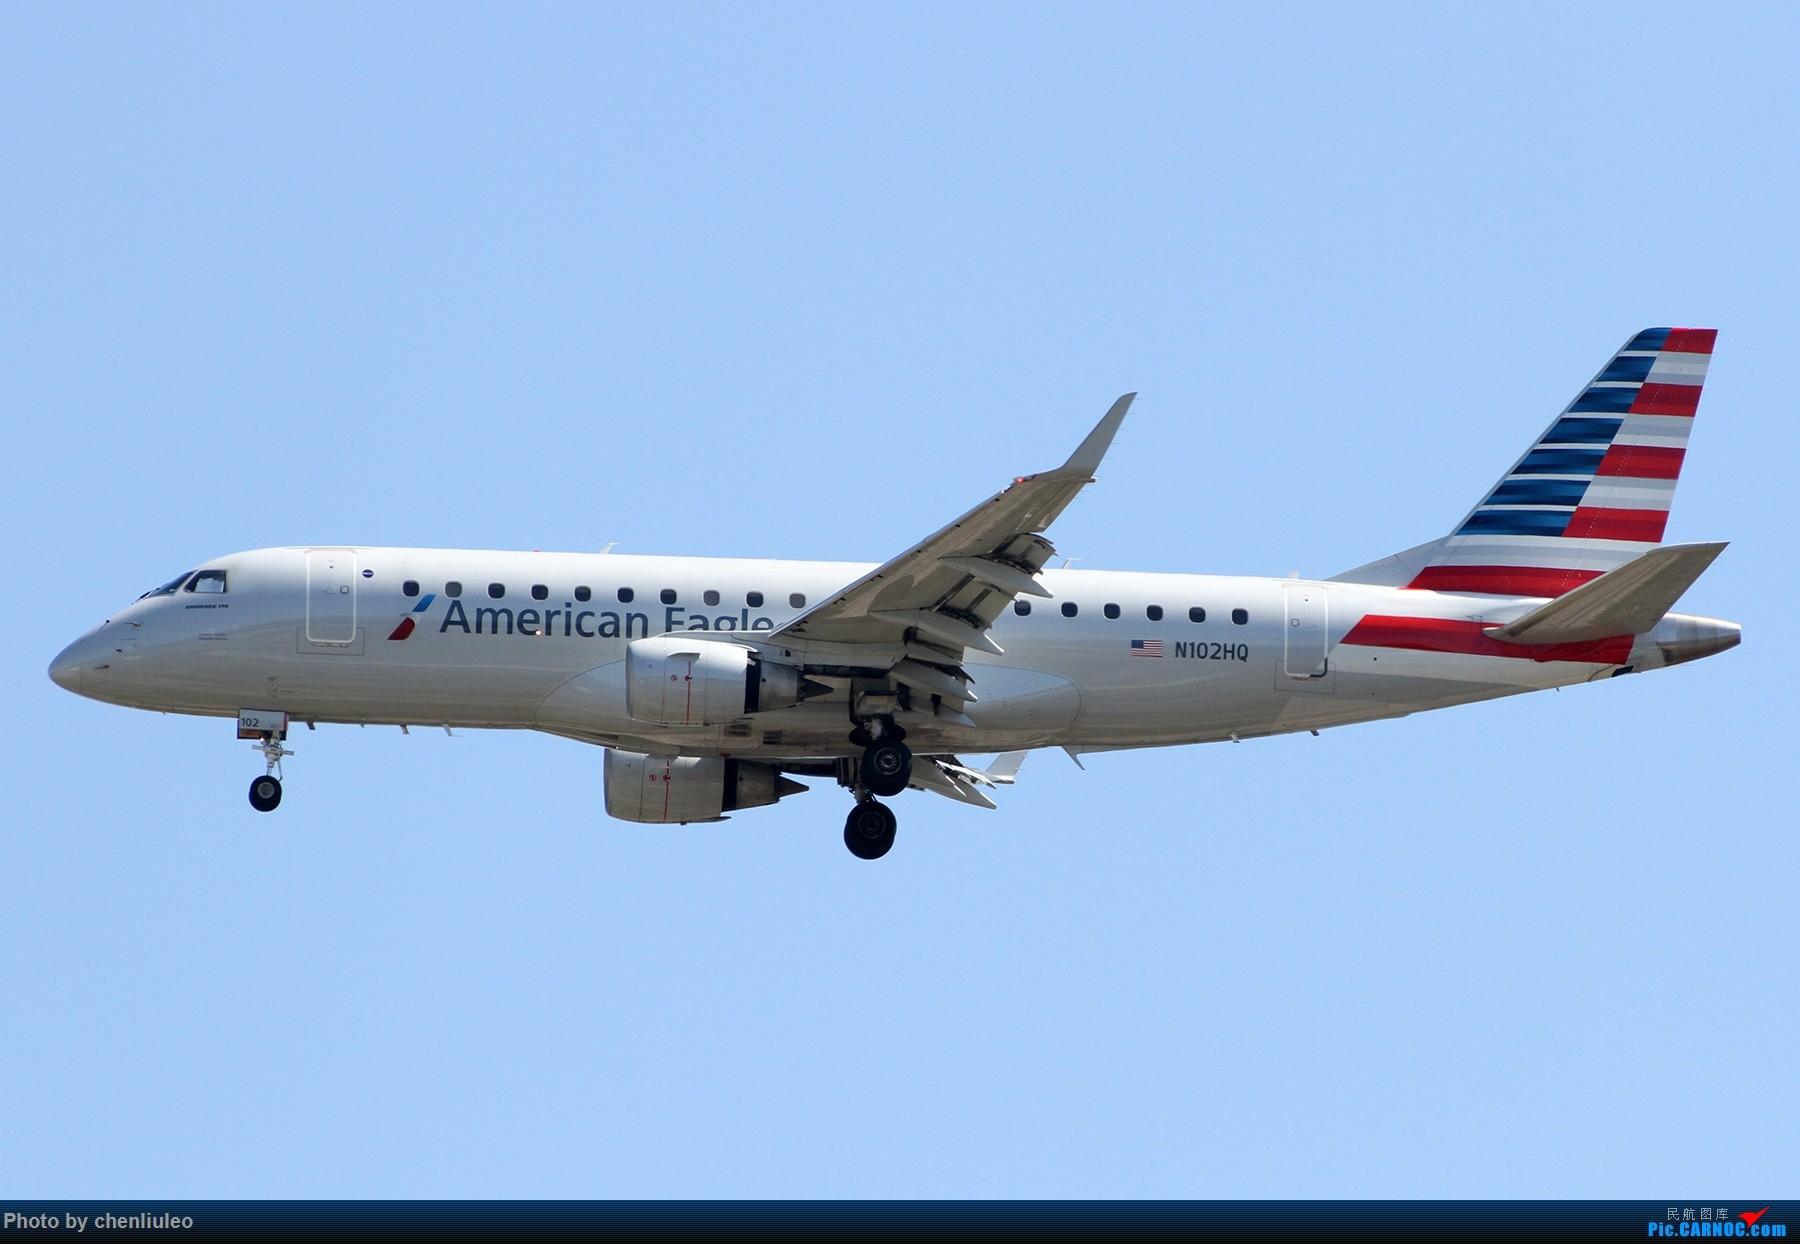 Re:[原创]【北美飞友会】本来是去等西南航空的新加州一号彩绘 结果有意外惊喜 美军C-40C EMBRAER E175 N102HQ 美国圣路易斯机场